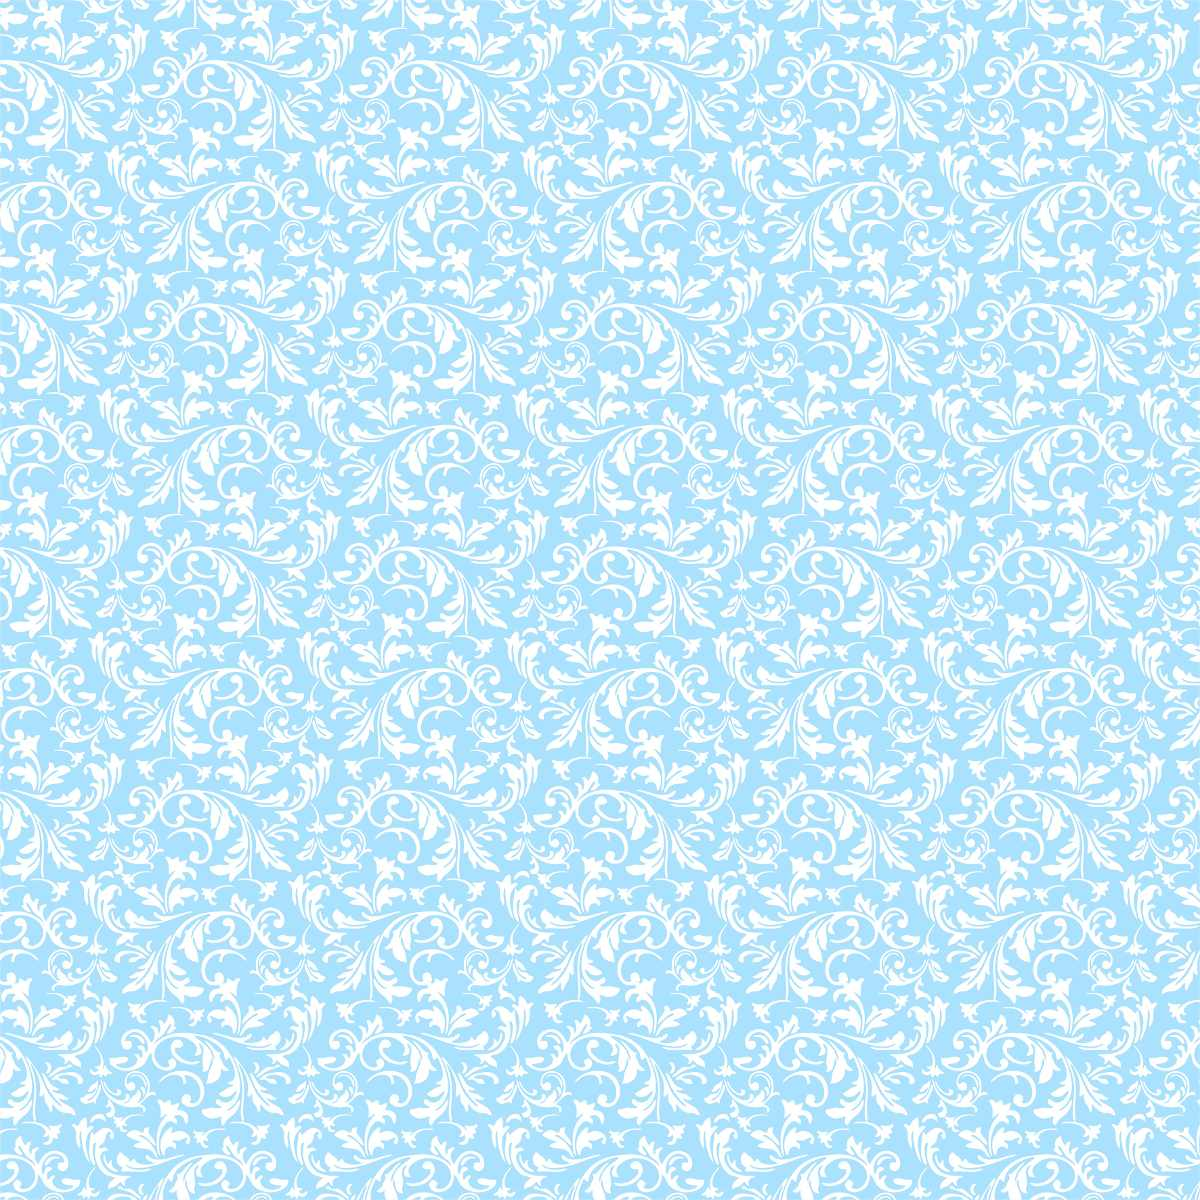 Kit Arabesco Papel Digital Cores Scrapbook Brinde R 7 99 Em